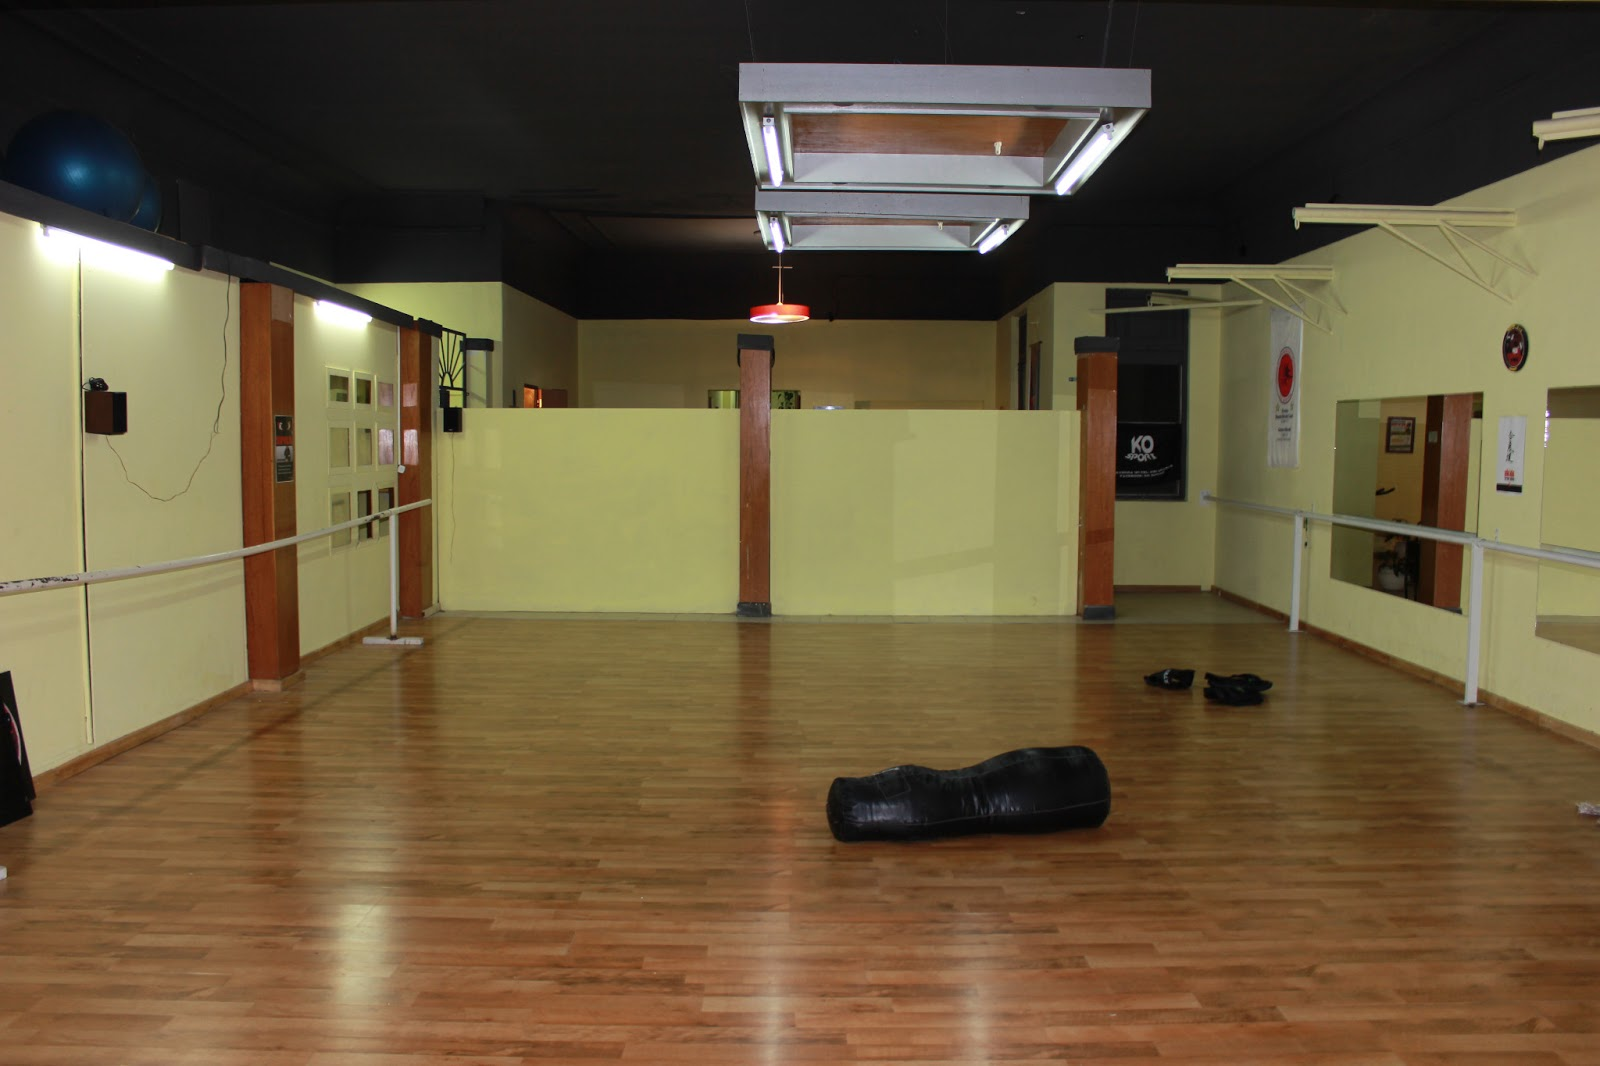 Clases y gimnasios en bahia blanca fitness gimnasia - Espejos para gimnasio ...